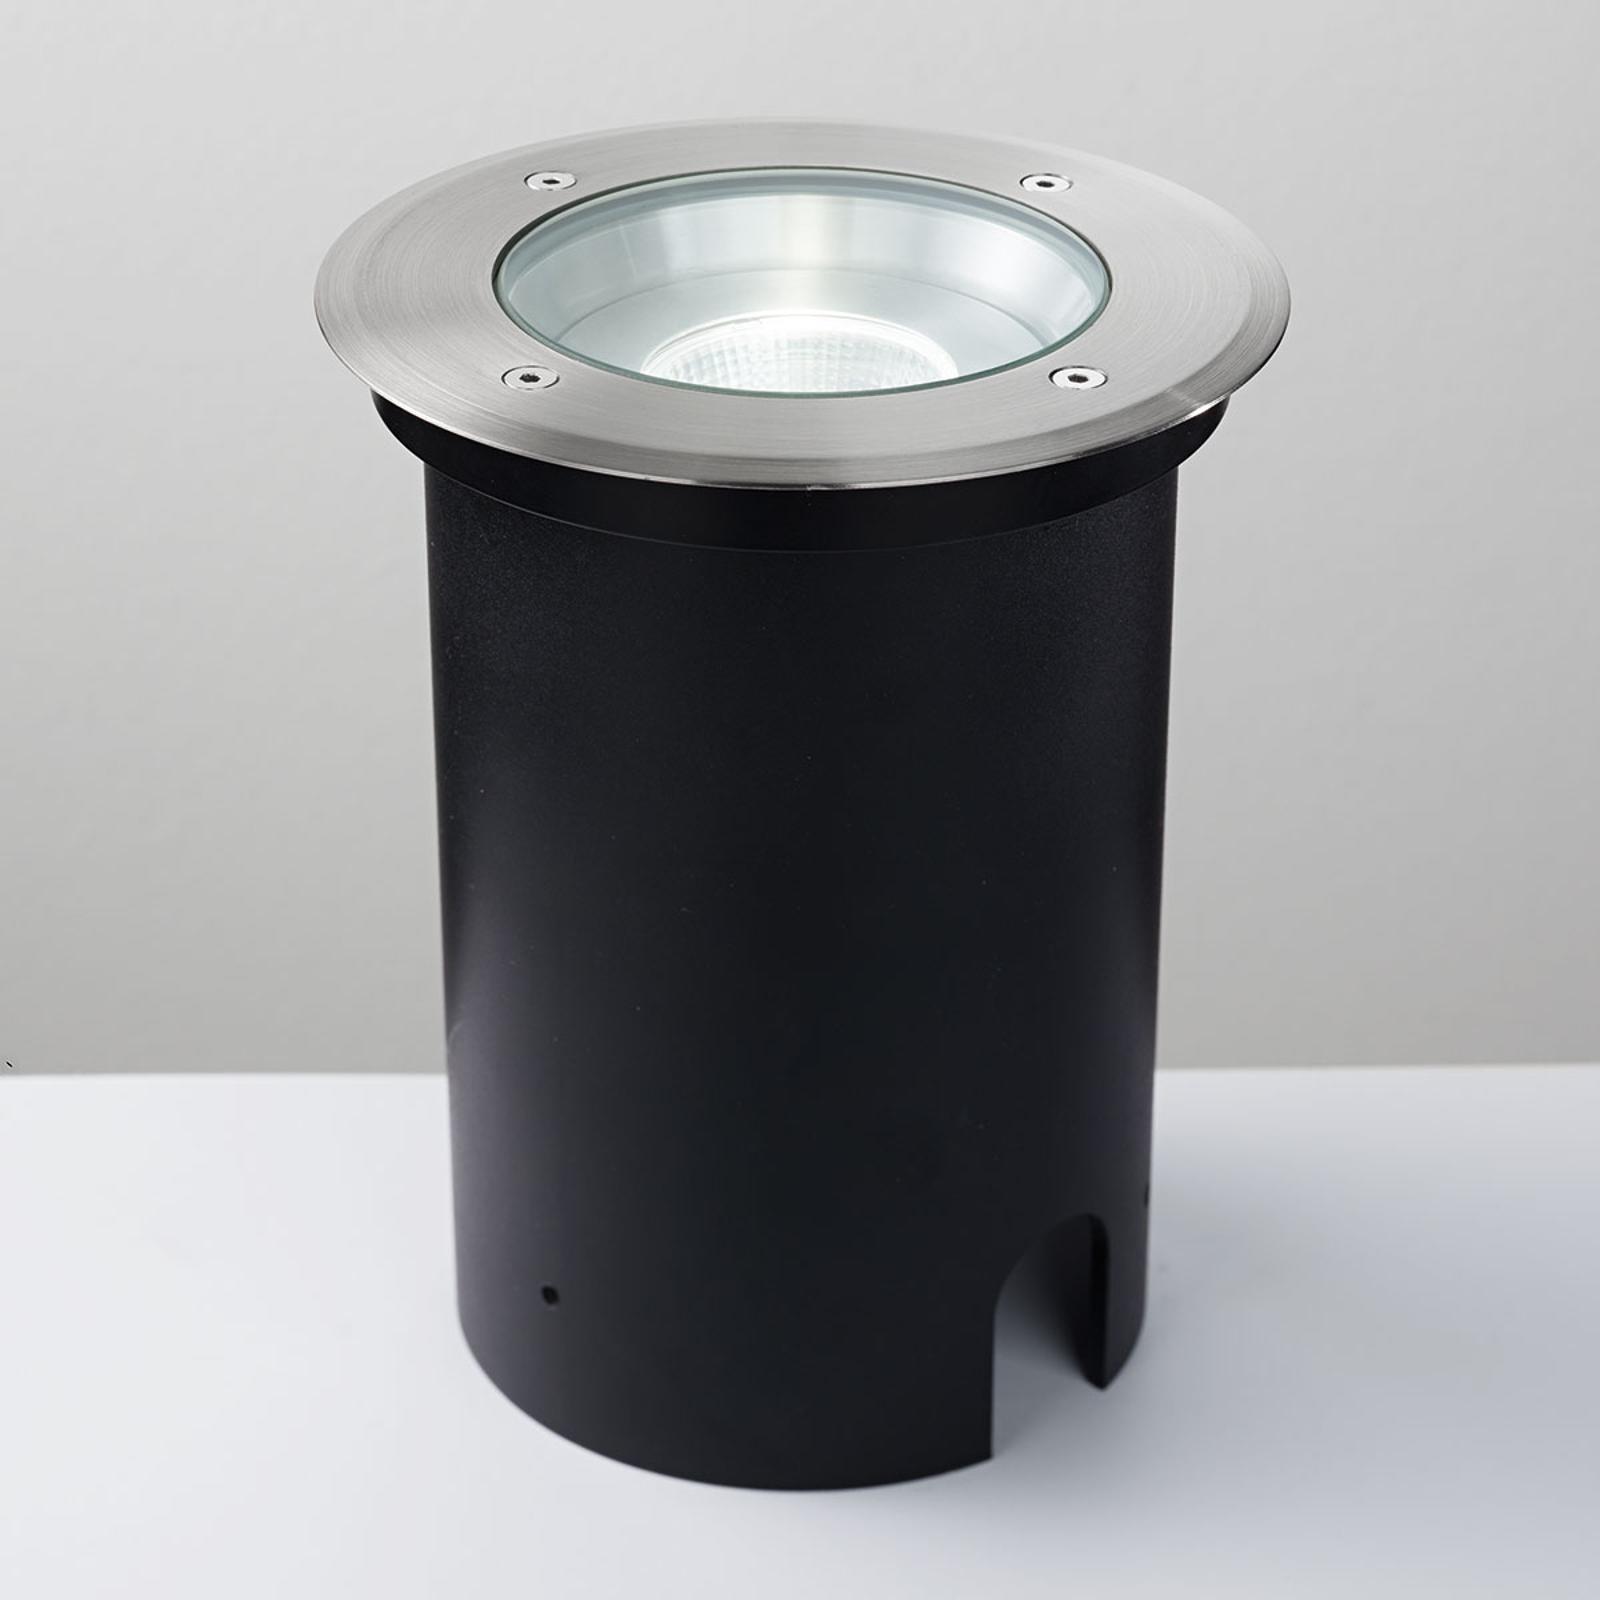 Scotty 6 foco de suelo LED empotrado IP67